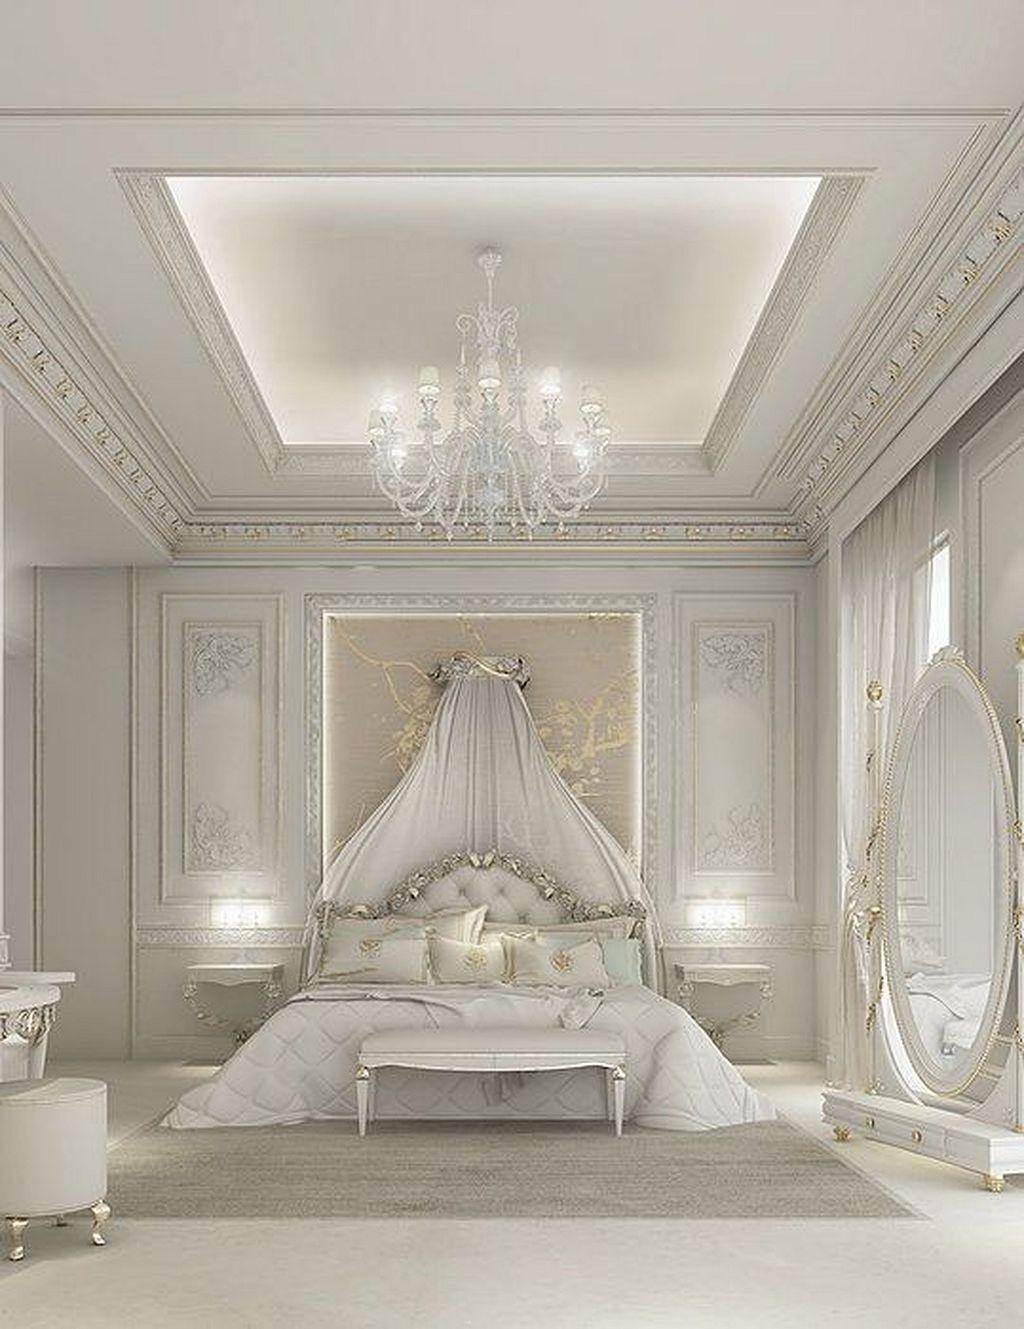 Wonderful White Master Bedroom Interior Design15 In 2020 Luxury Bedroom Master Luxurious Bedrooms Master Bedroom Interior